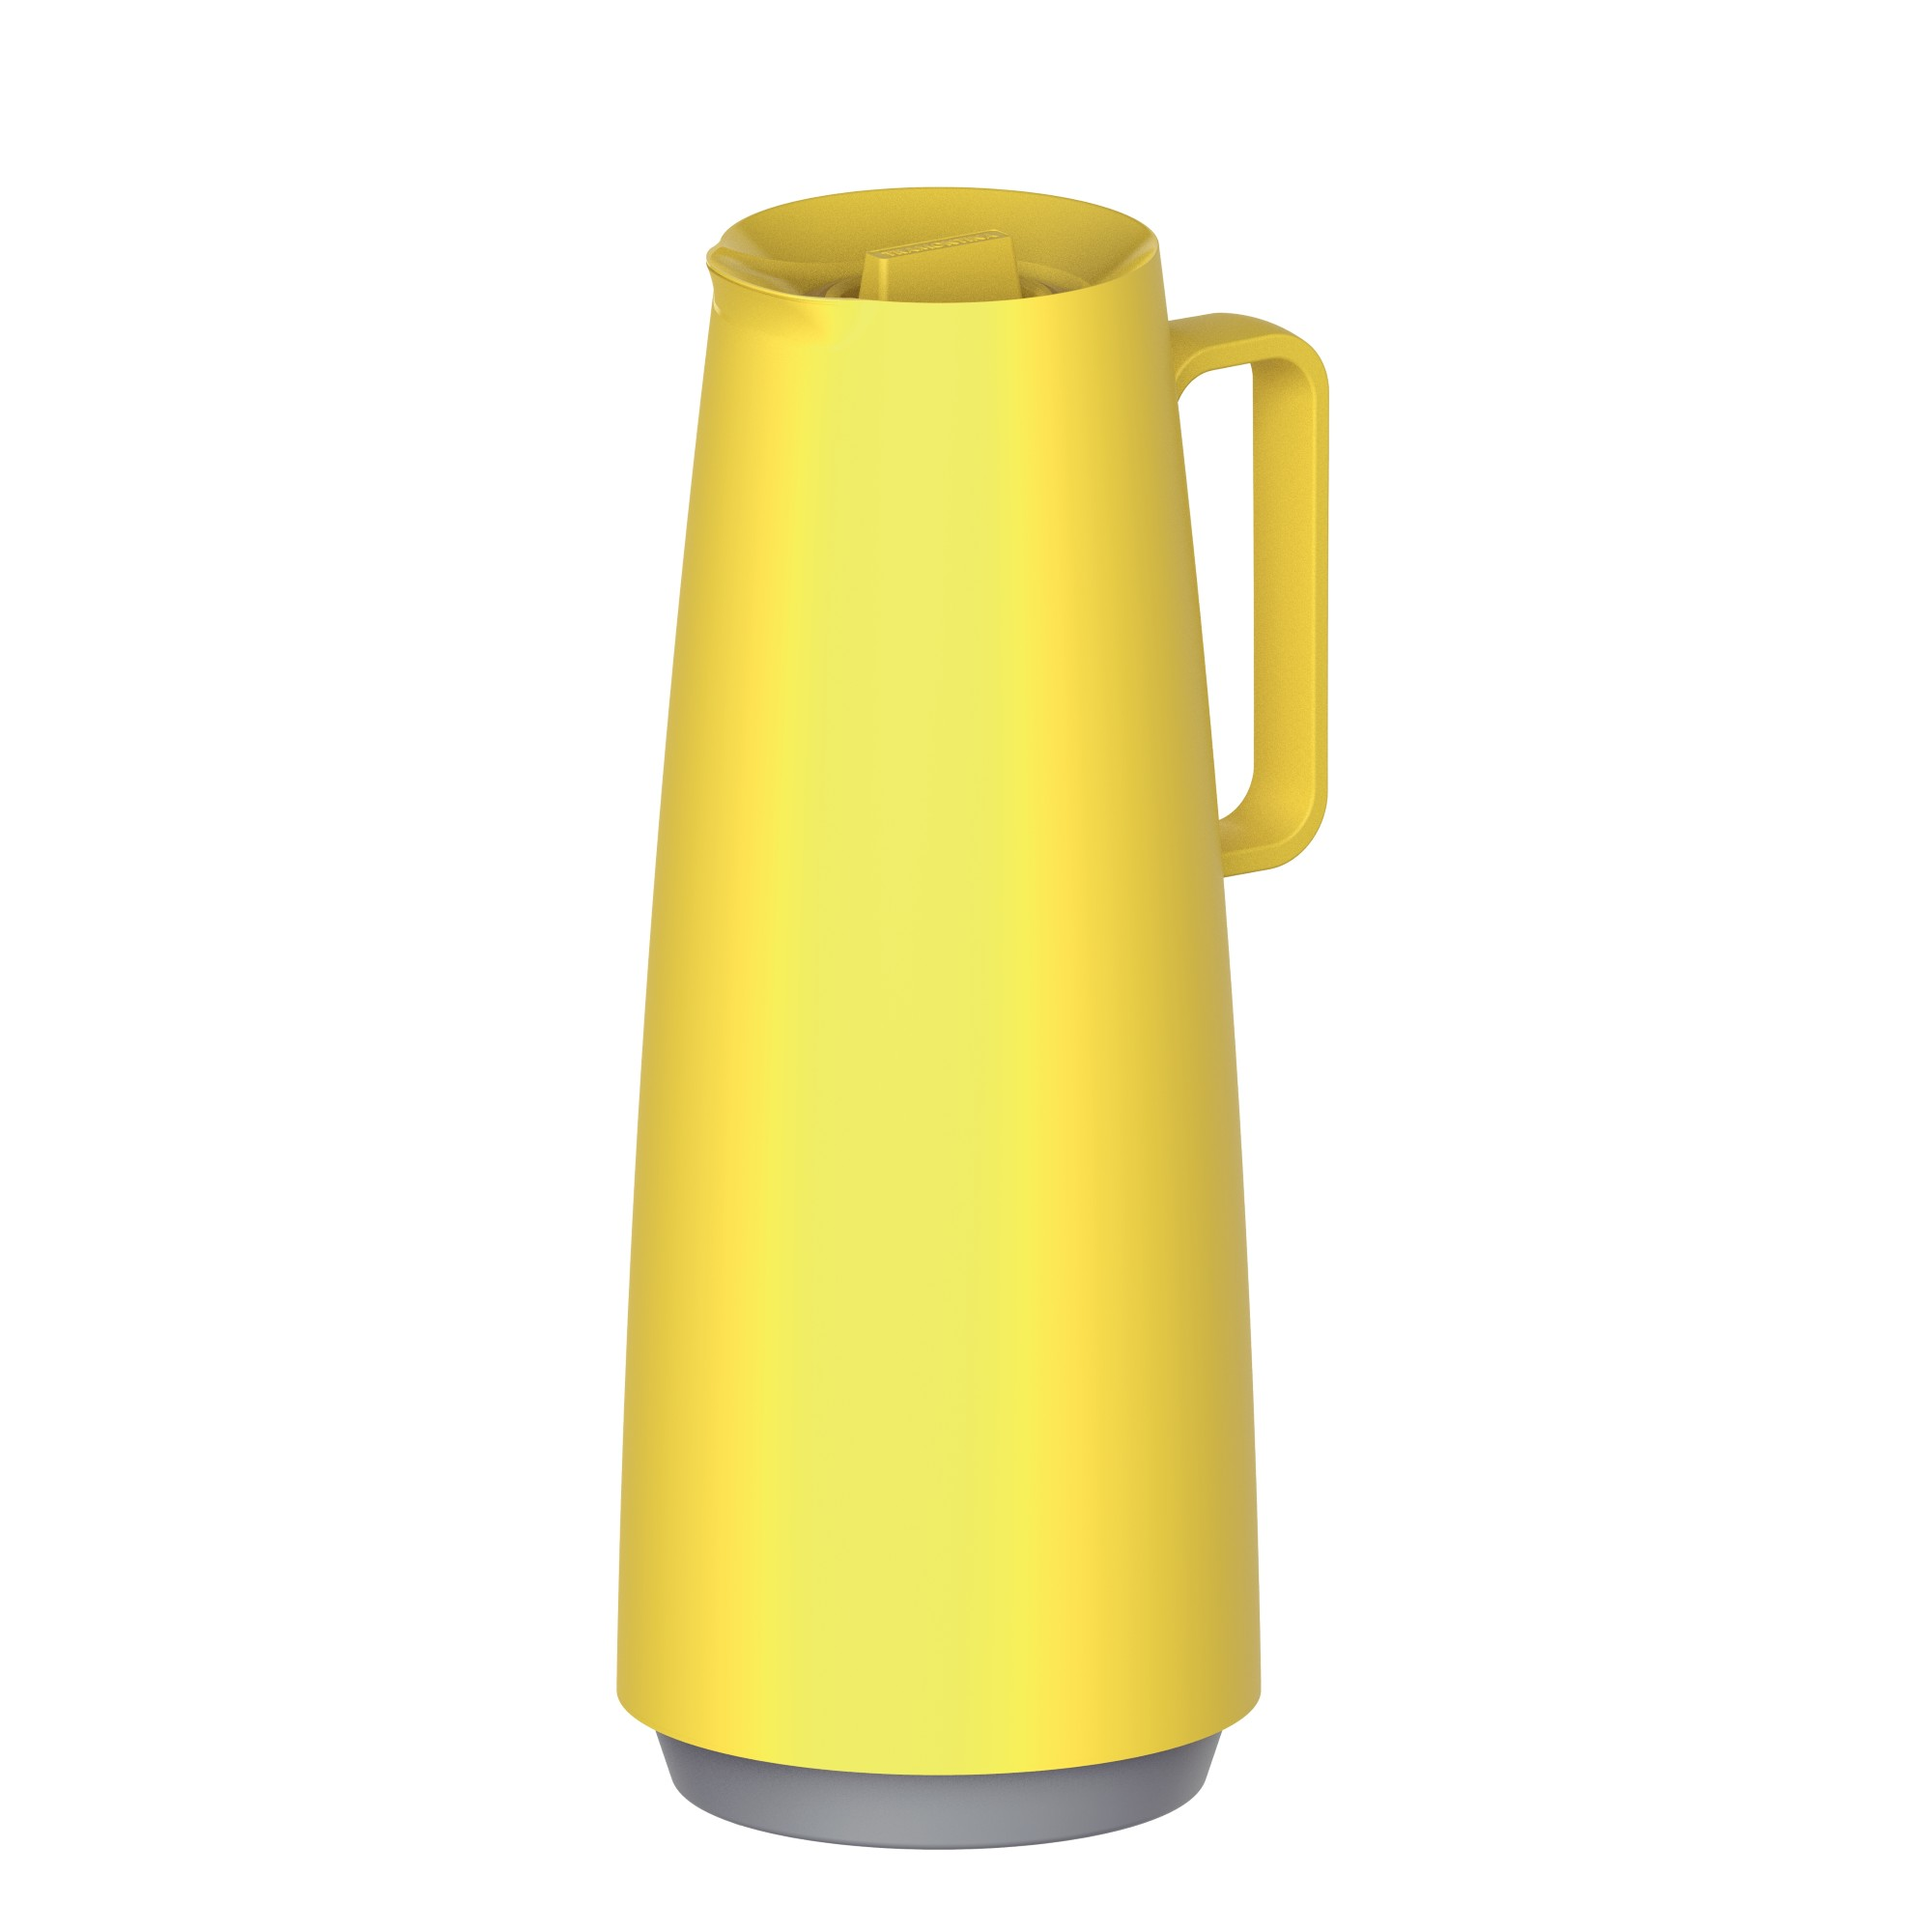 Bule Termico Exata Tramontina 1L Amarelo - 61636107